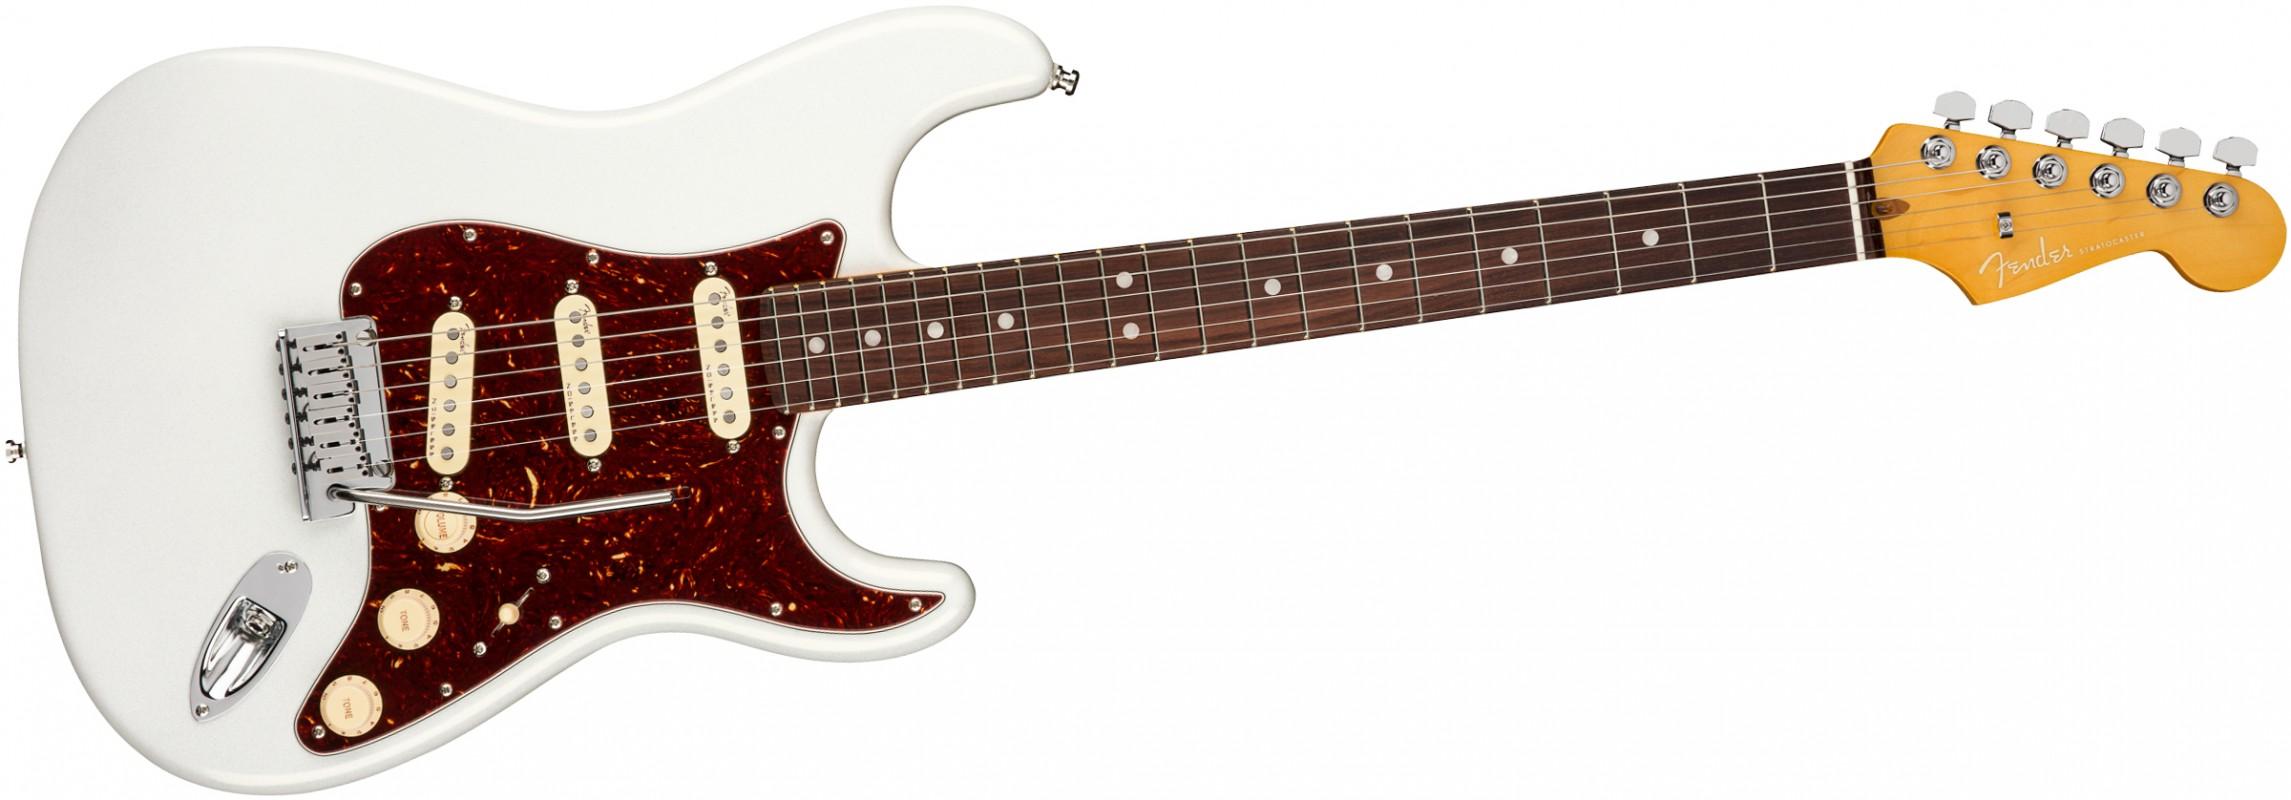 FENDER-American-Ultra-Stratocaster-RW-Arctic-Pearl-0118010781-sku-23907